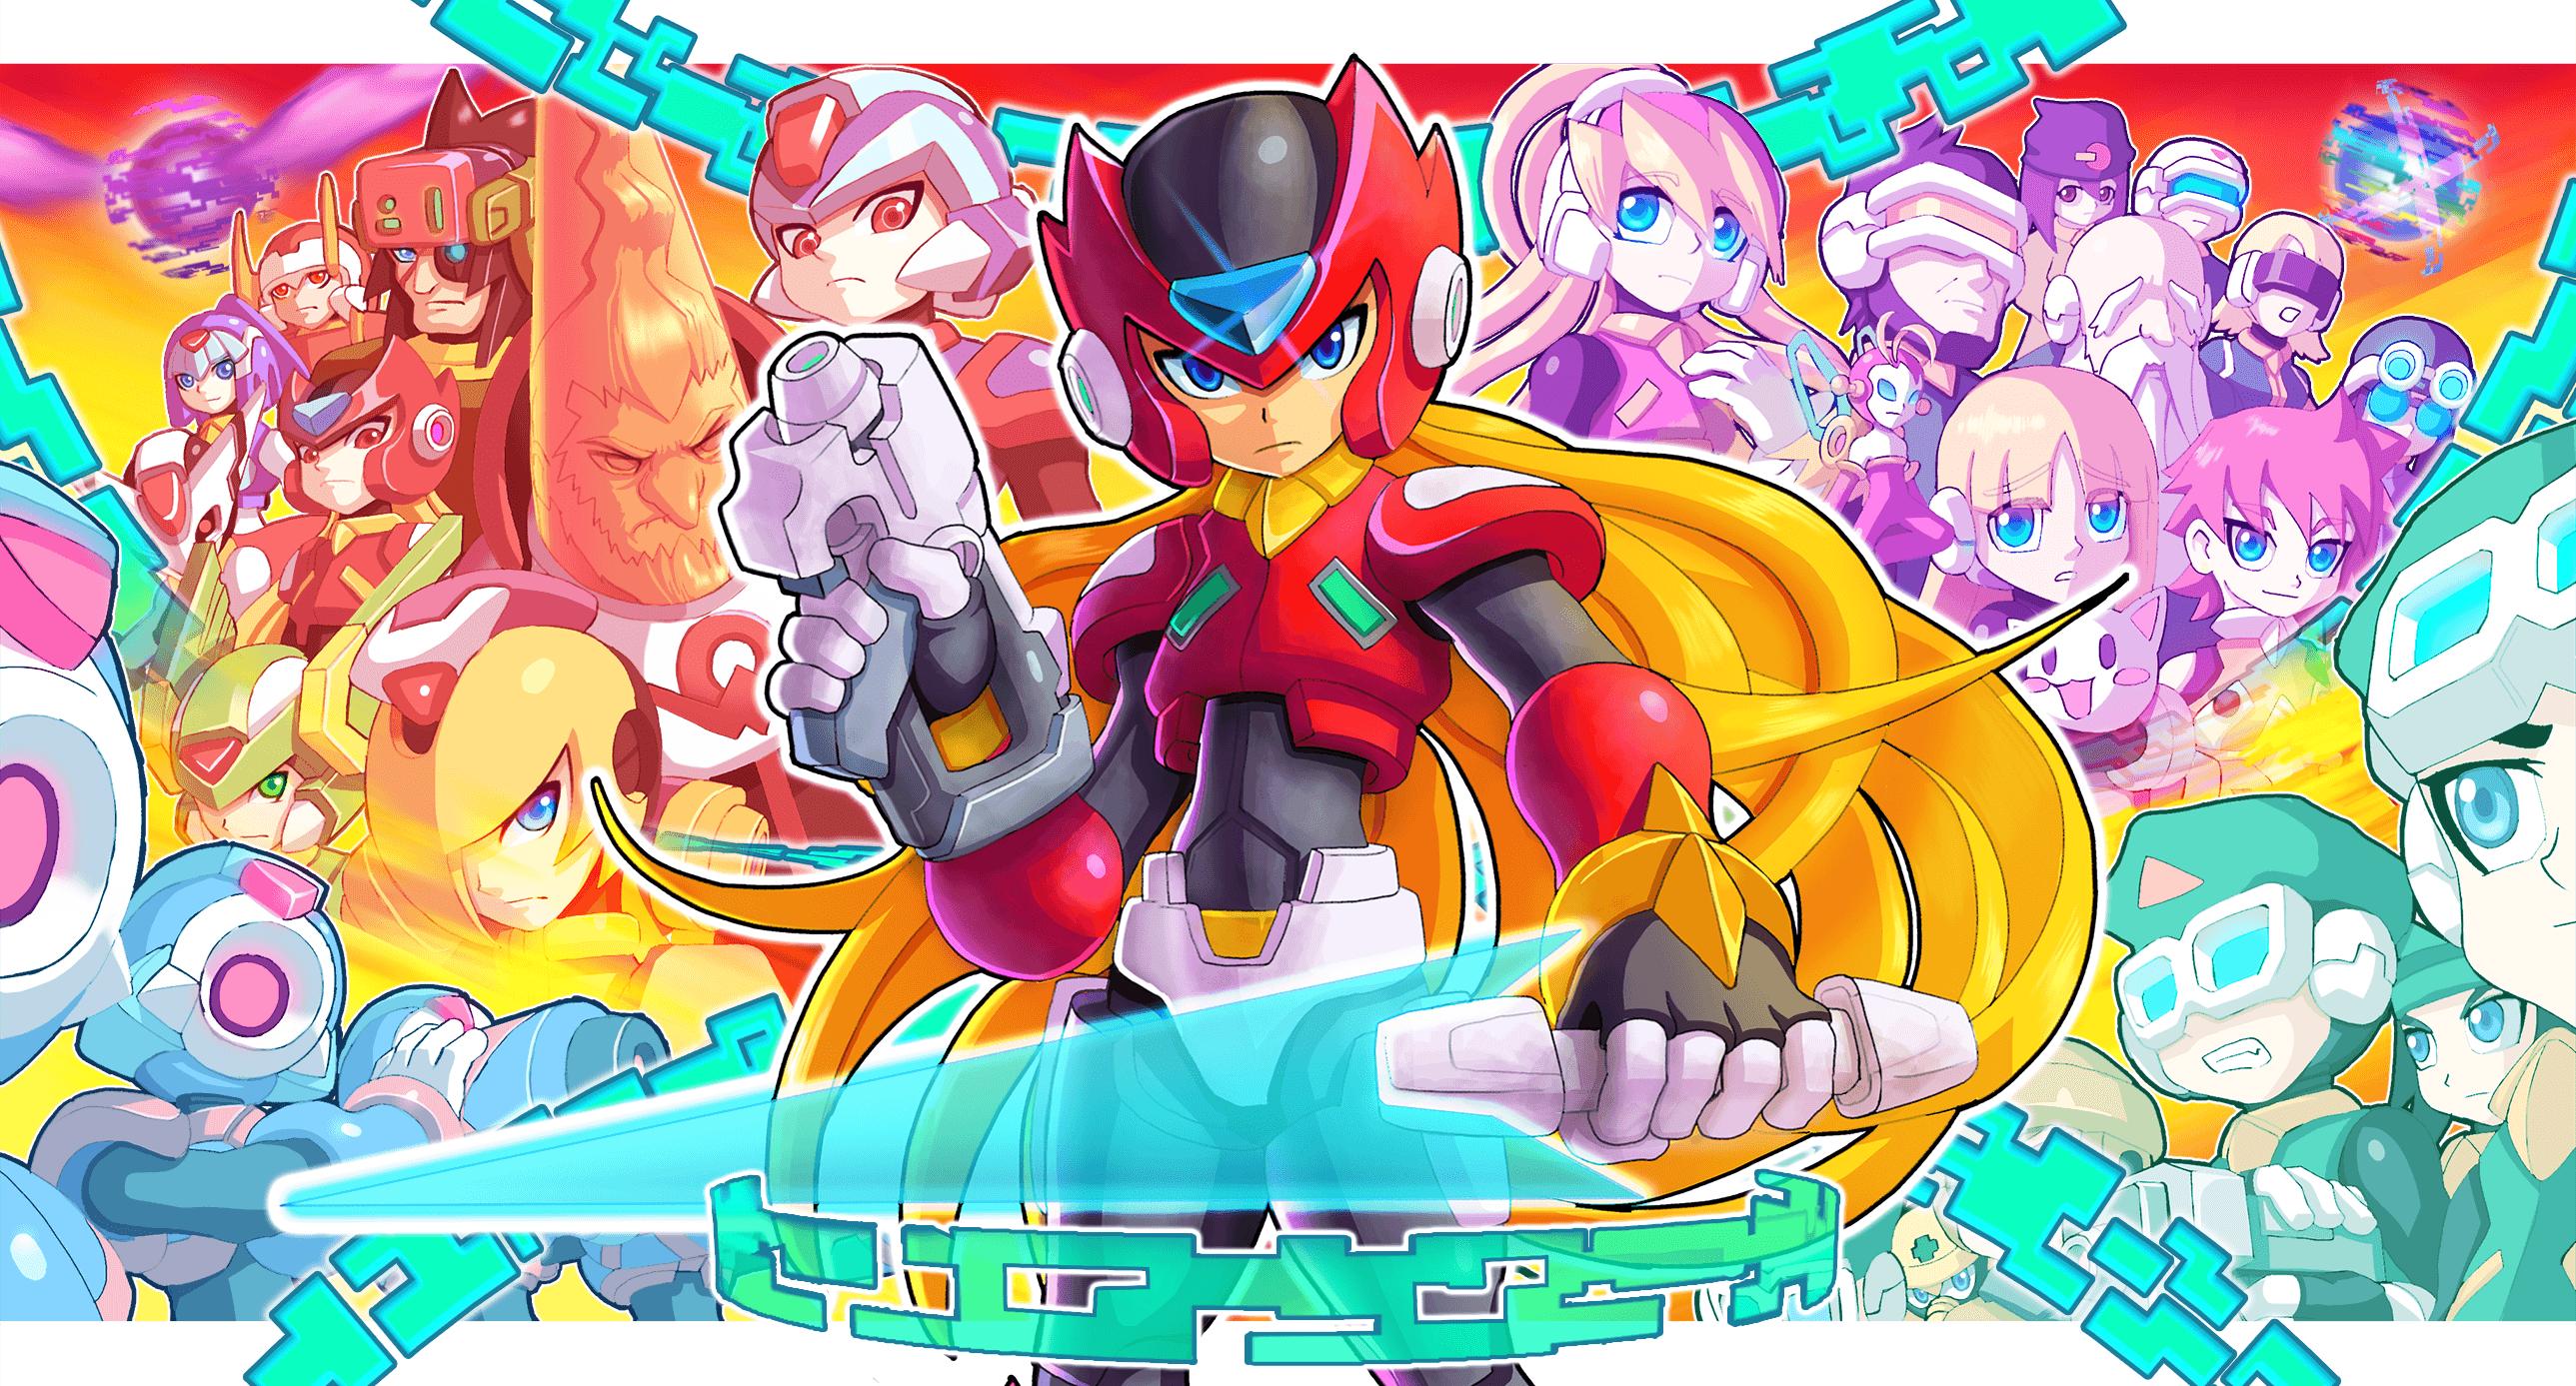 Beat Mega Man Wallpapers - Wallpaper Cave